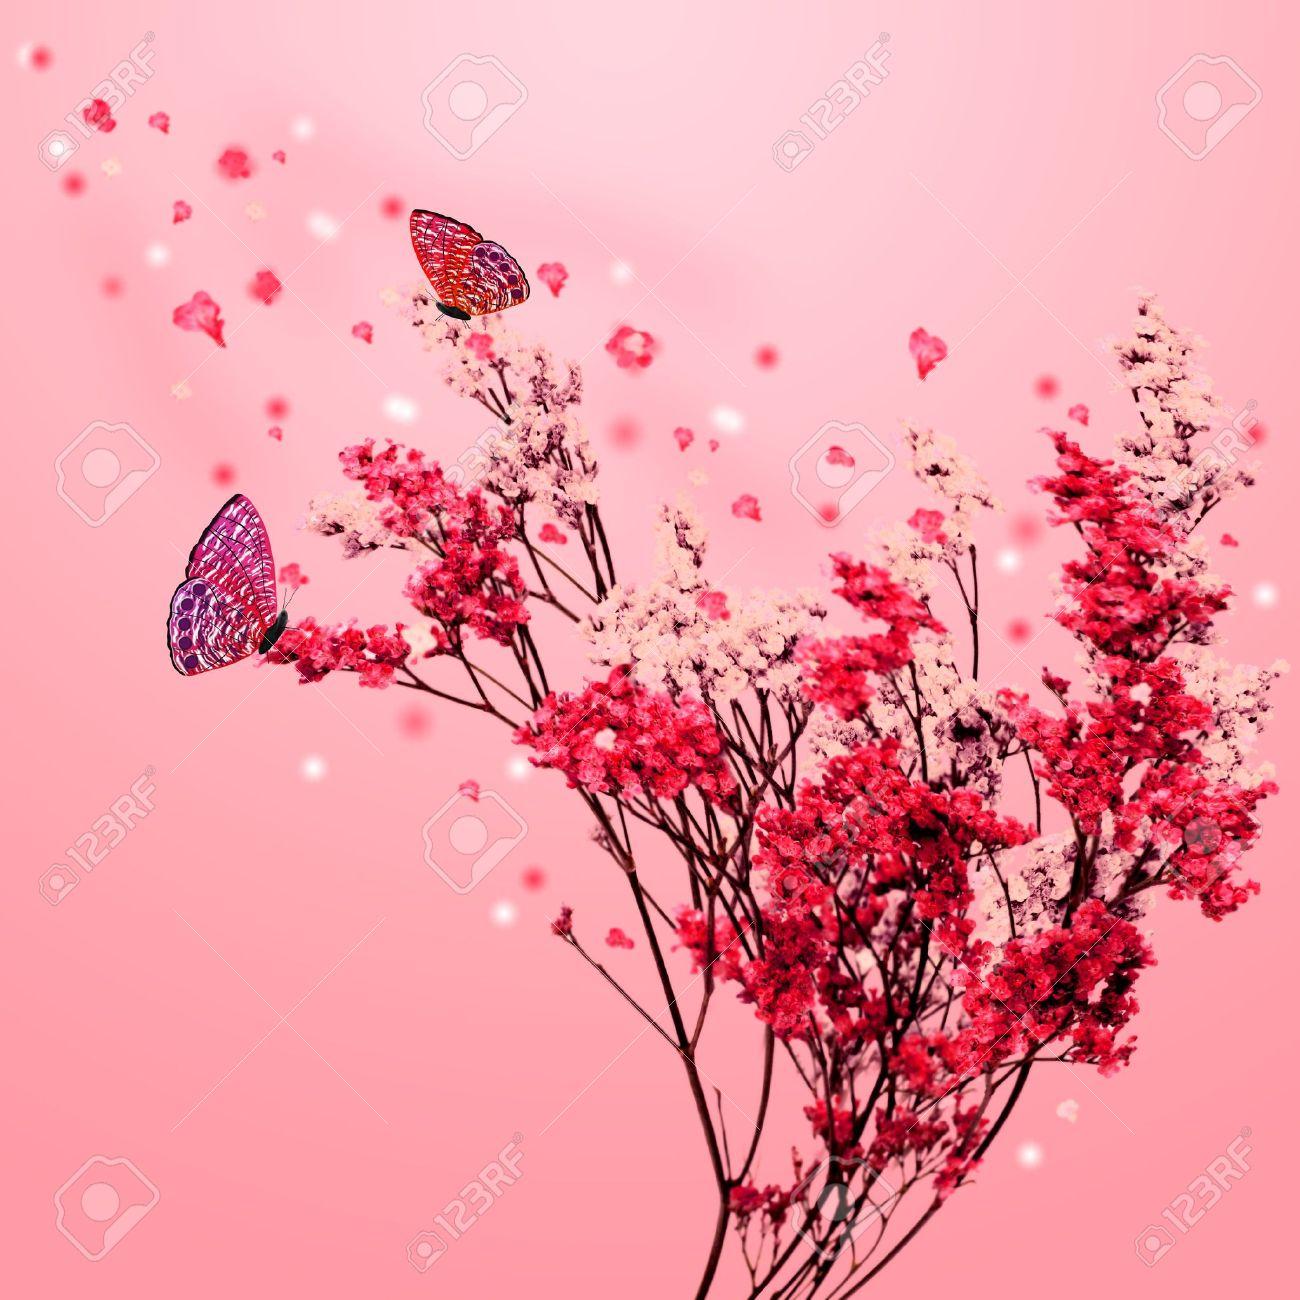 Beautiful blossom tree with pink flowers petals fall and butterfly beautiful blossom tree with pink flowers petals fall and butterfly stock photo 17969819 mightylinksfo